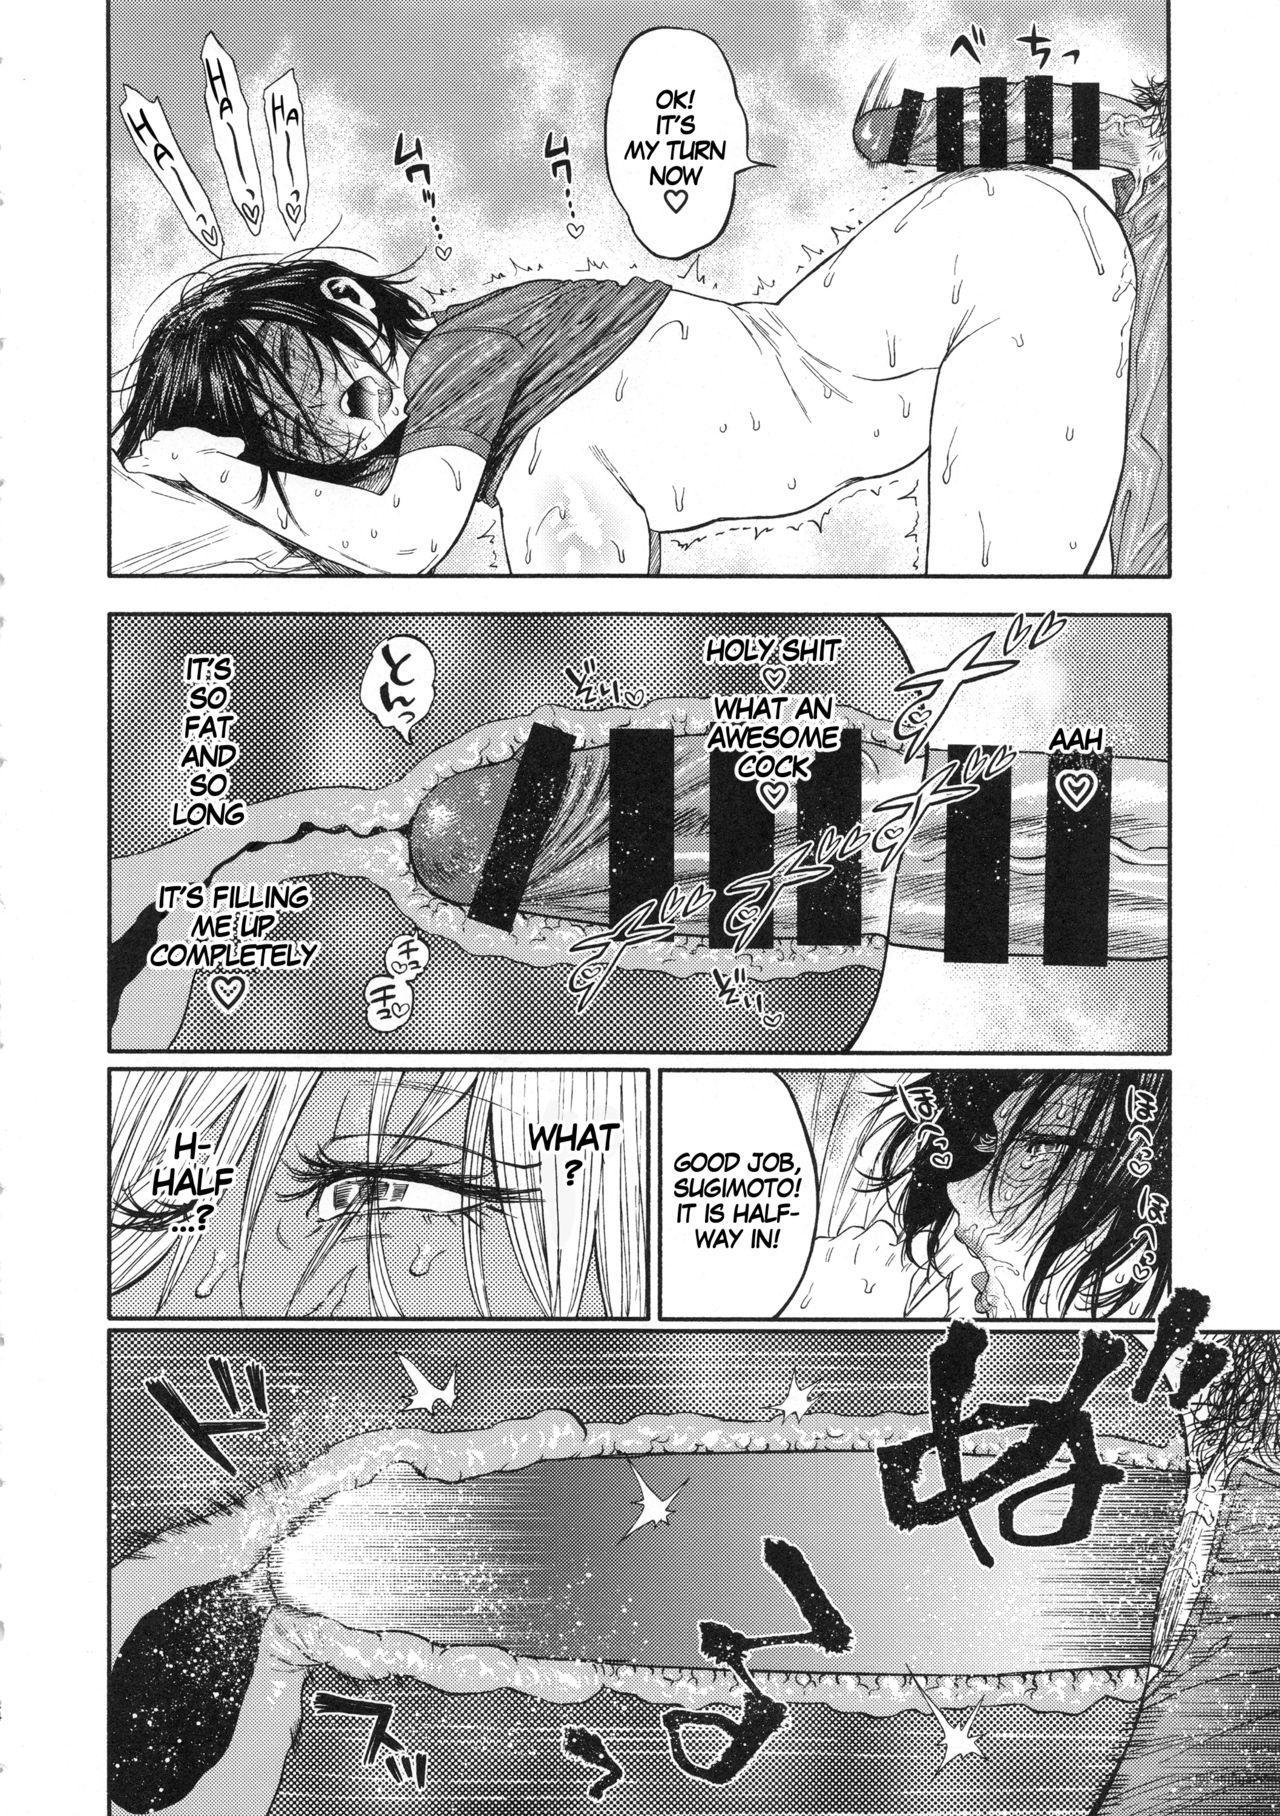 (SPARK13) [JAPAN (USA)] Sugimoto-san to Rakko Nabe Shiyou.   Let's Have Some Sea Otter Meat With Sugimoto-san (Golden Kamuy) [English] [MegaFagget] 22